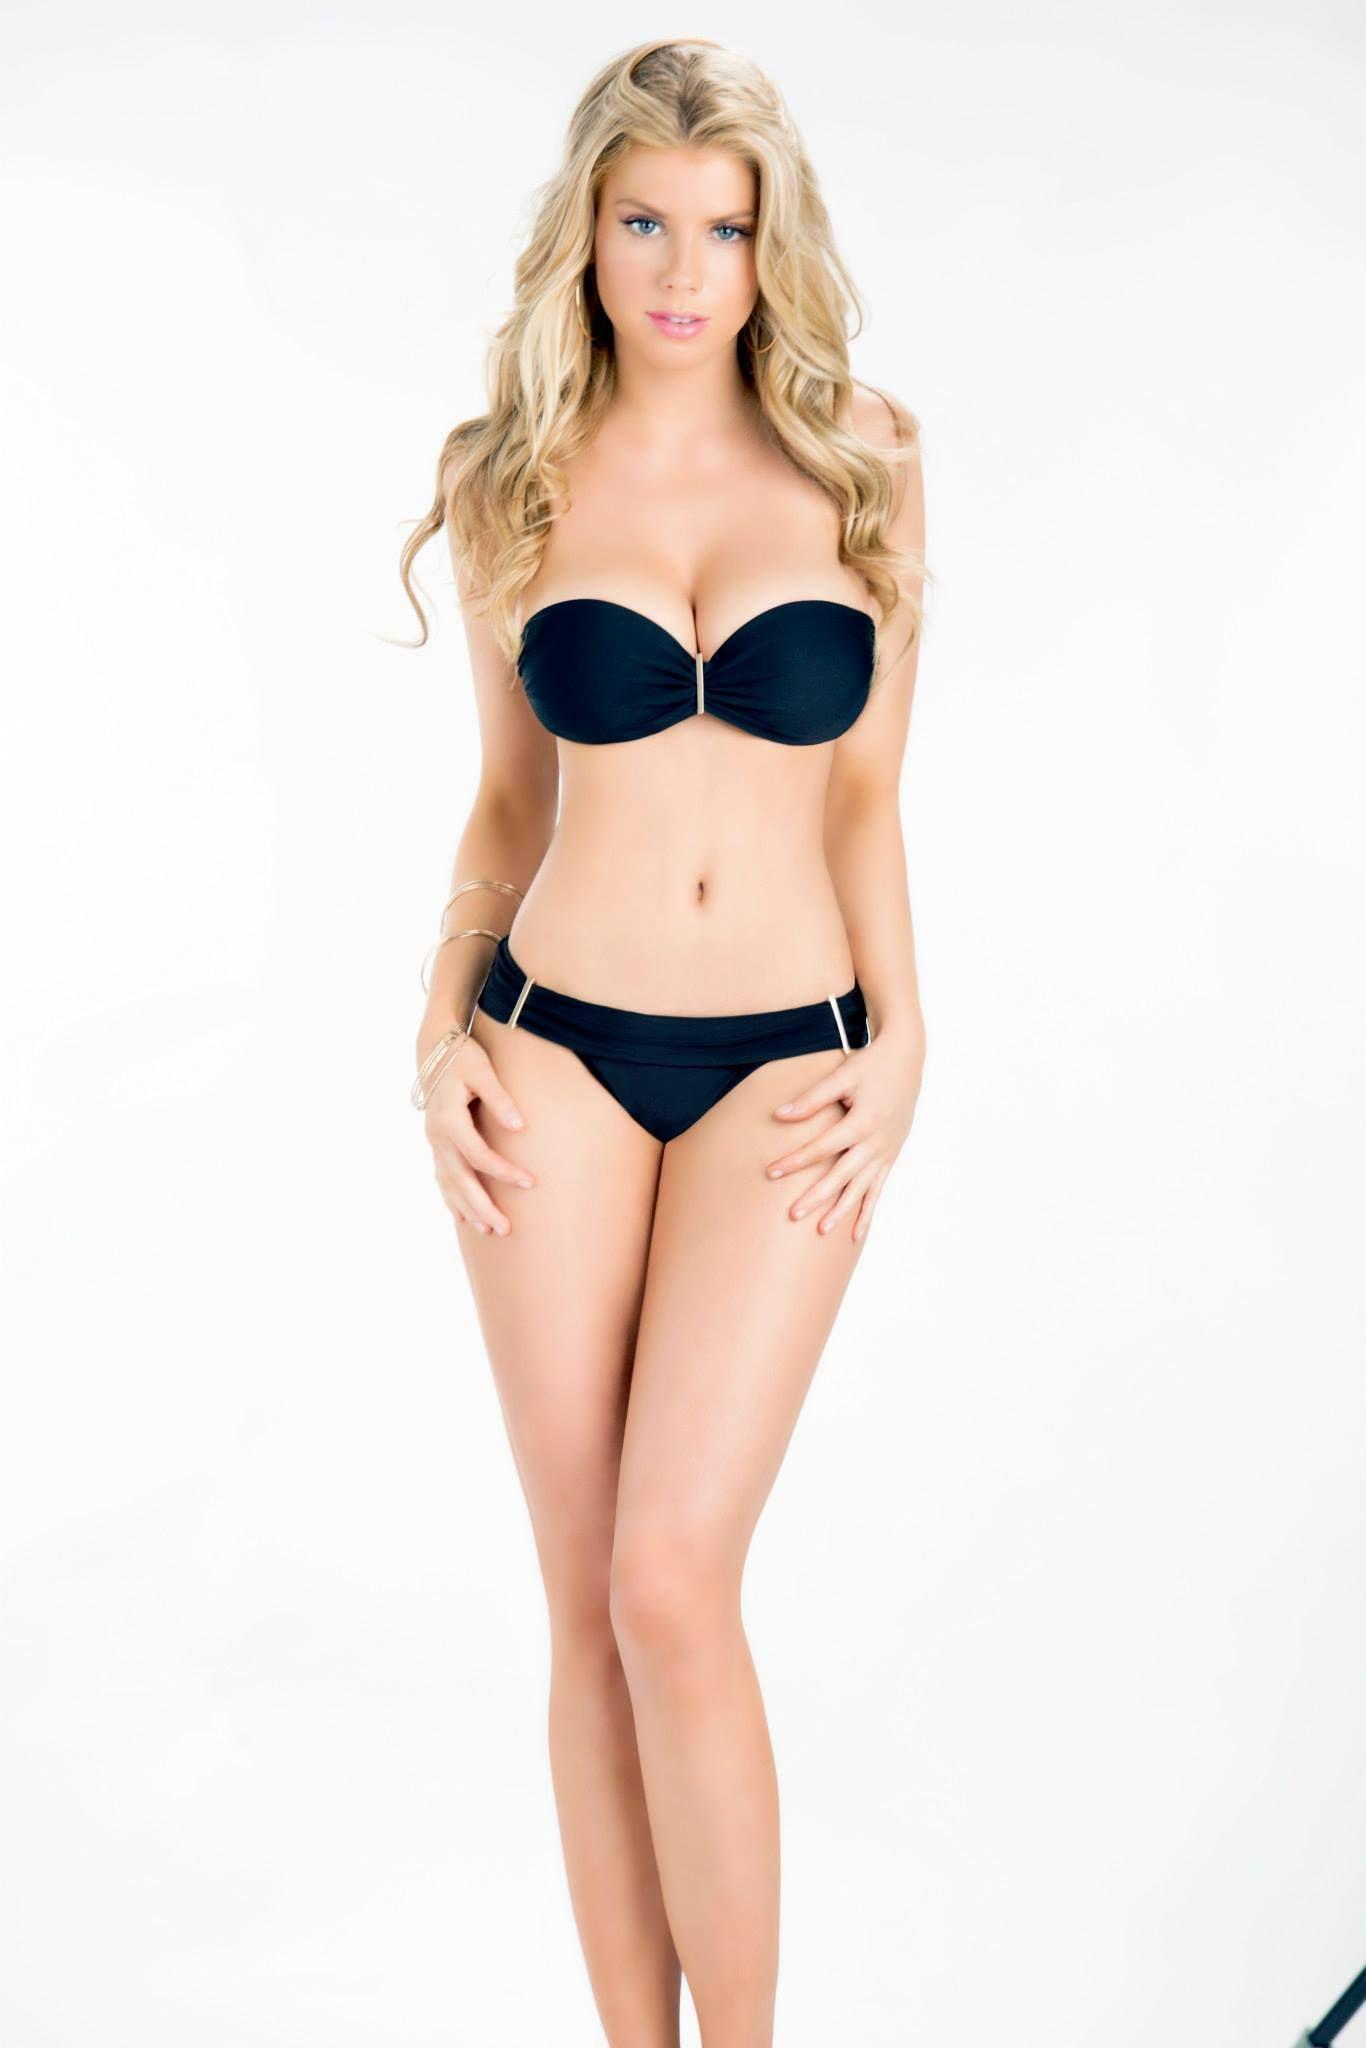 charlotte mckinney body measurement